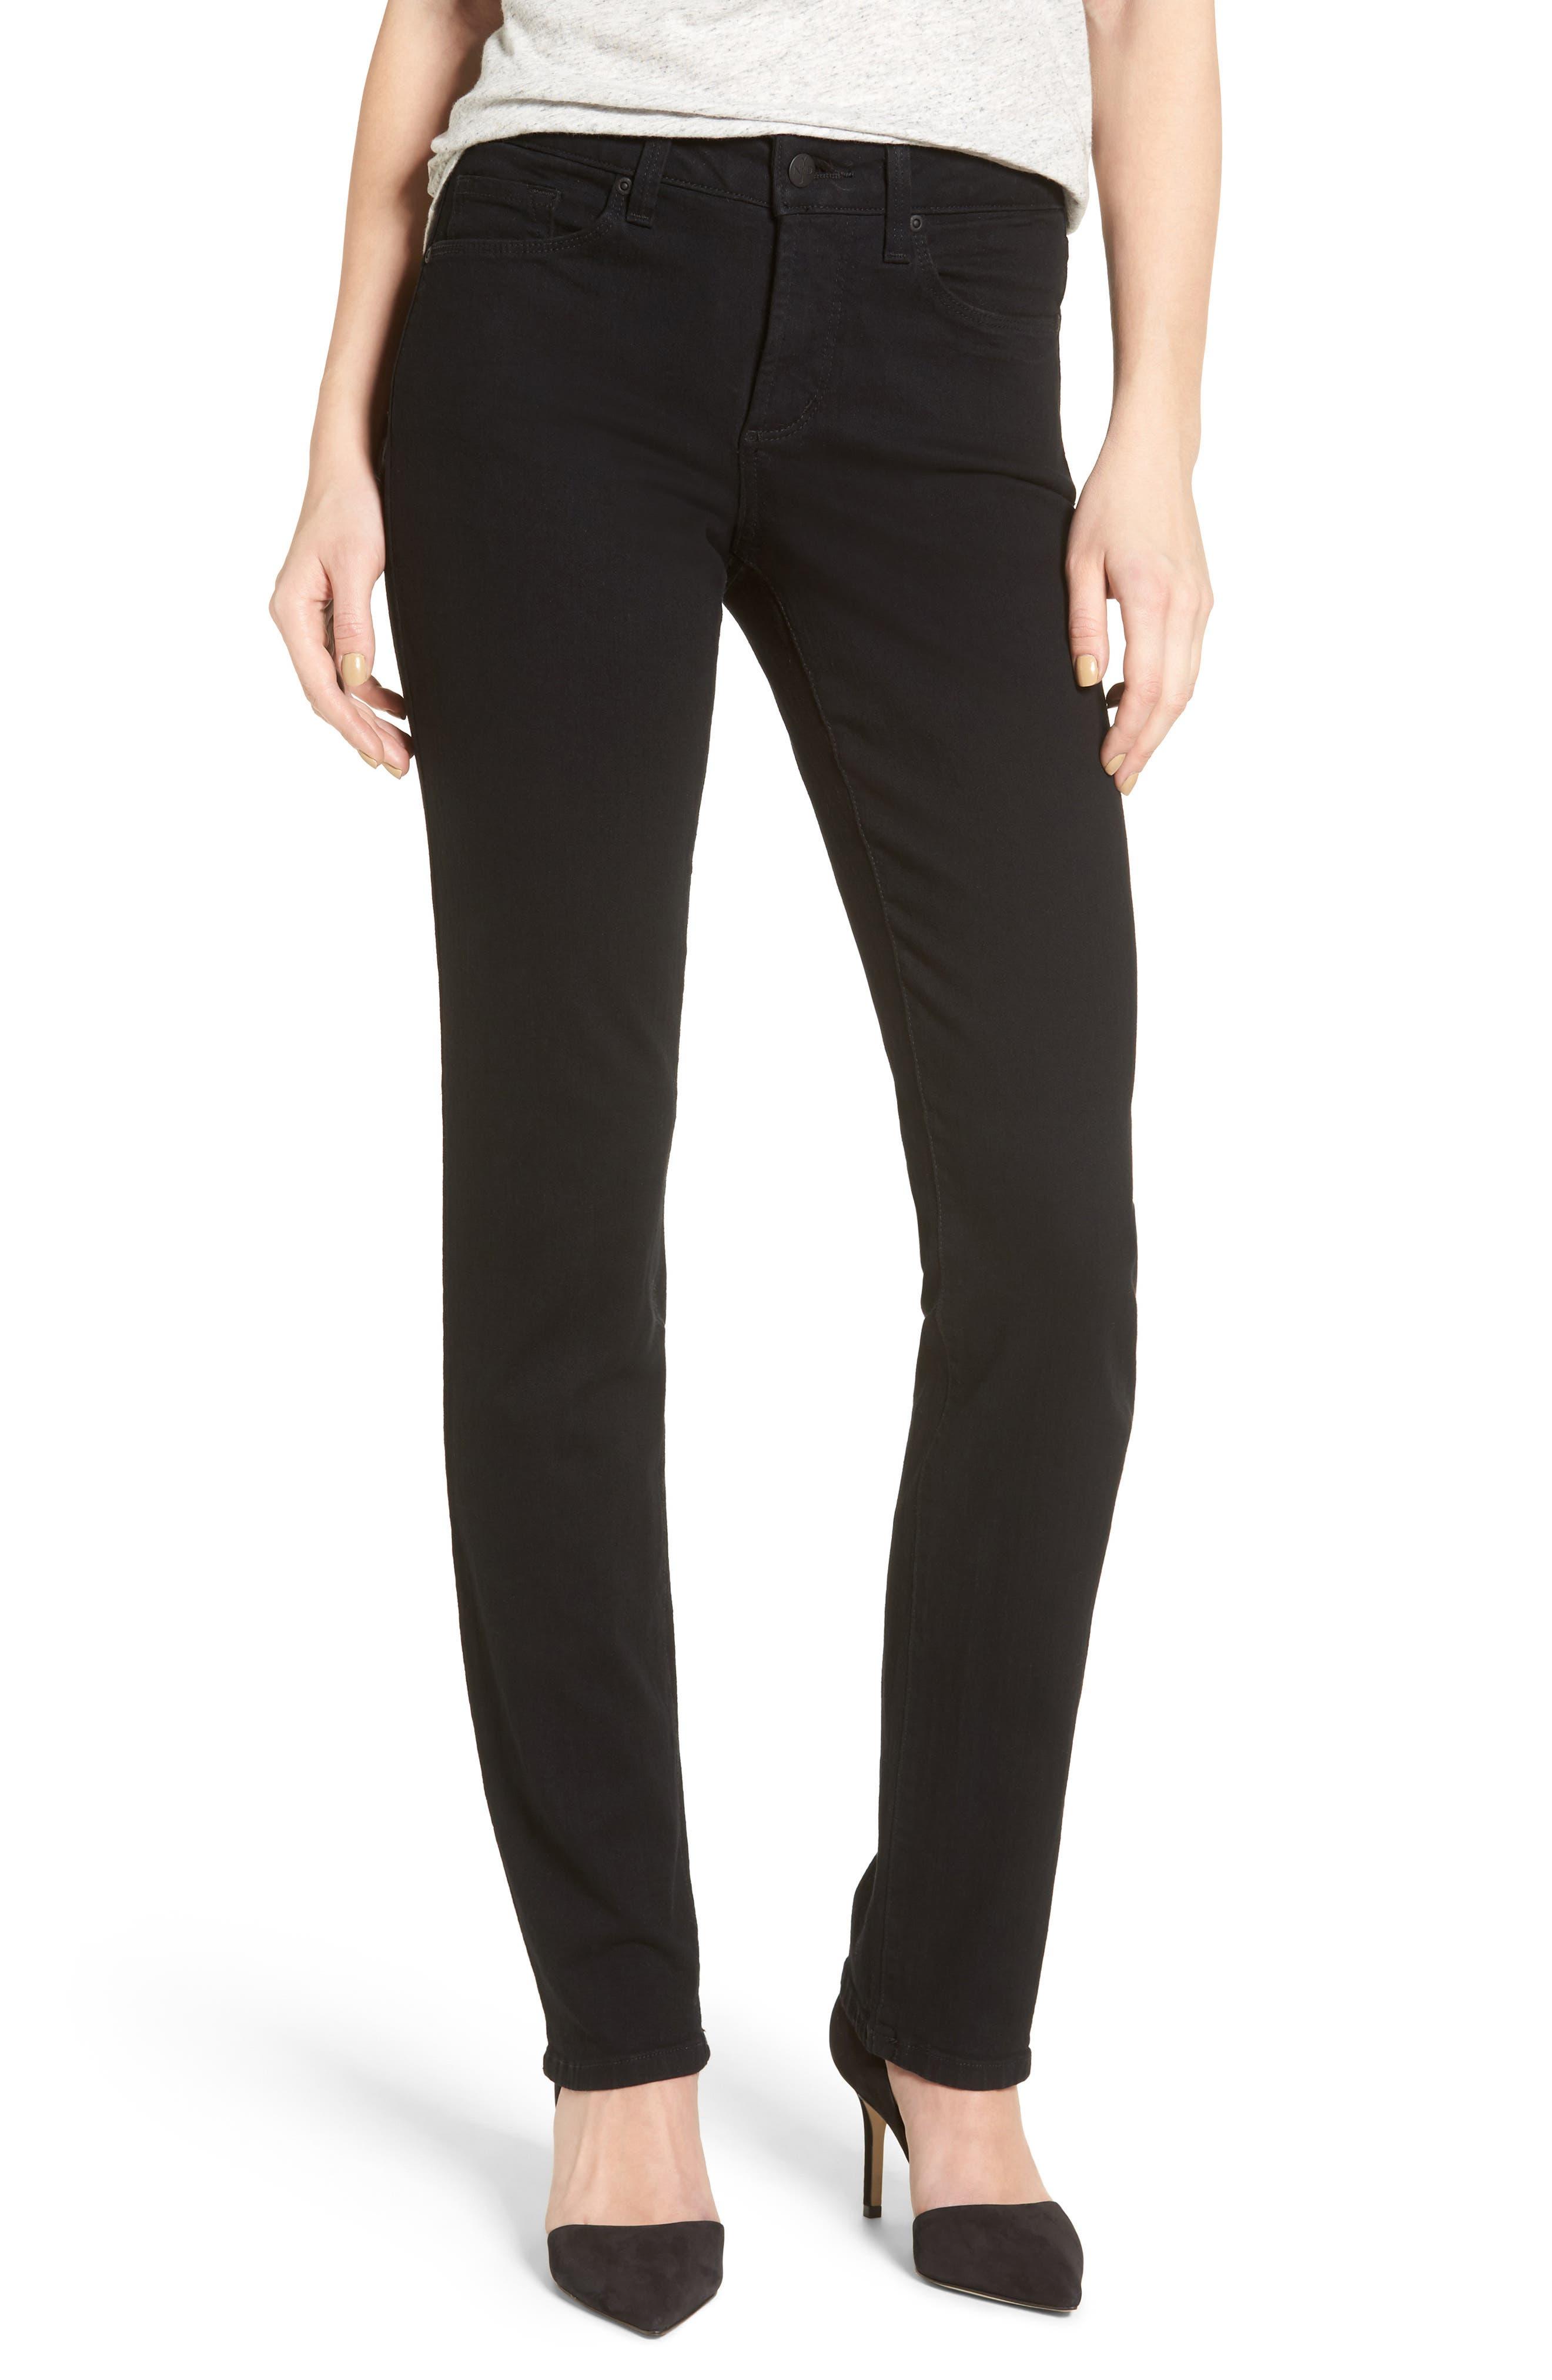 Alternate Image 1 Selected - NYDJ Sheri Stretch Skinny Jeans (Long)